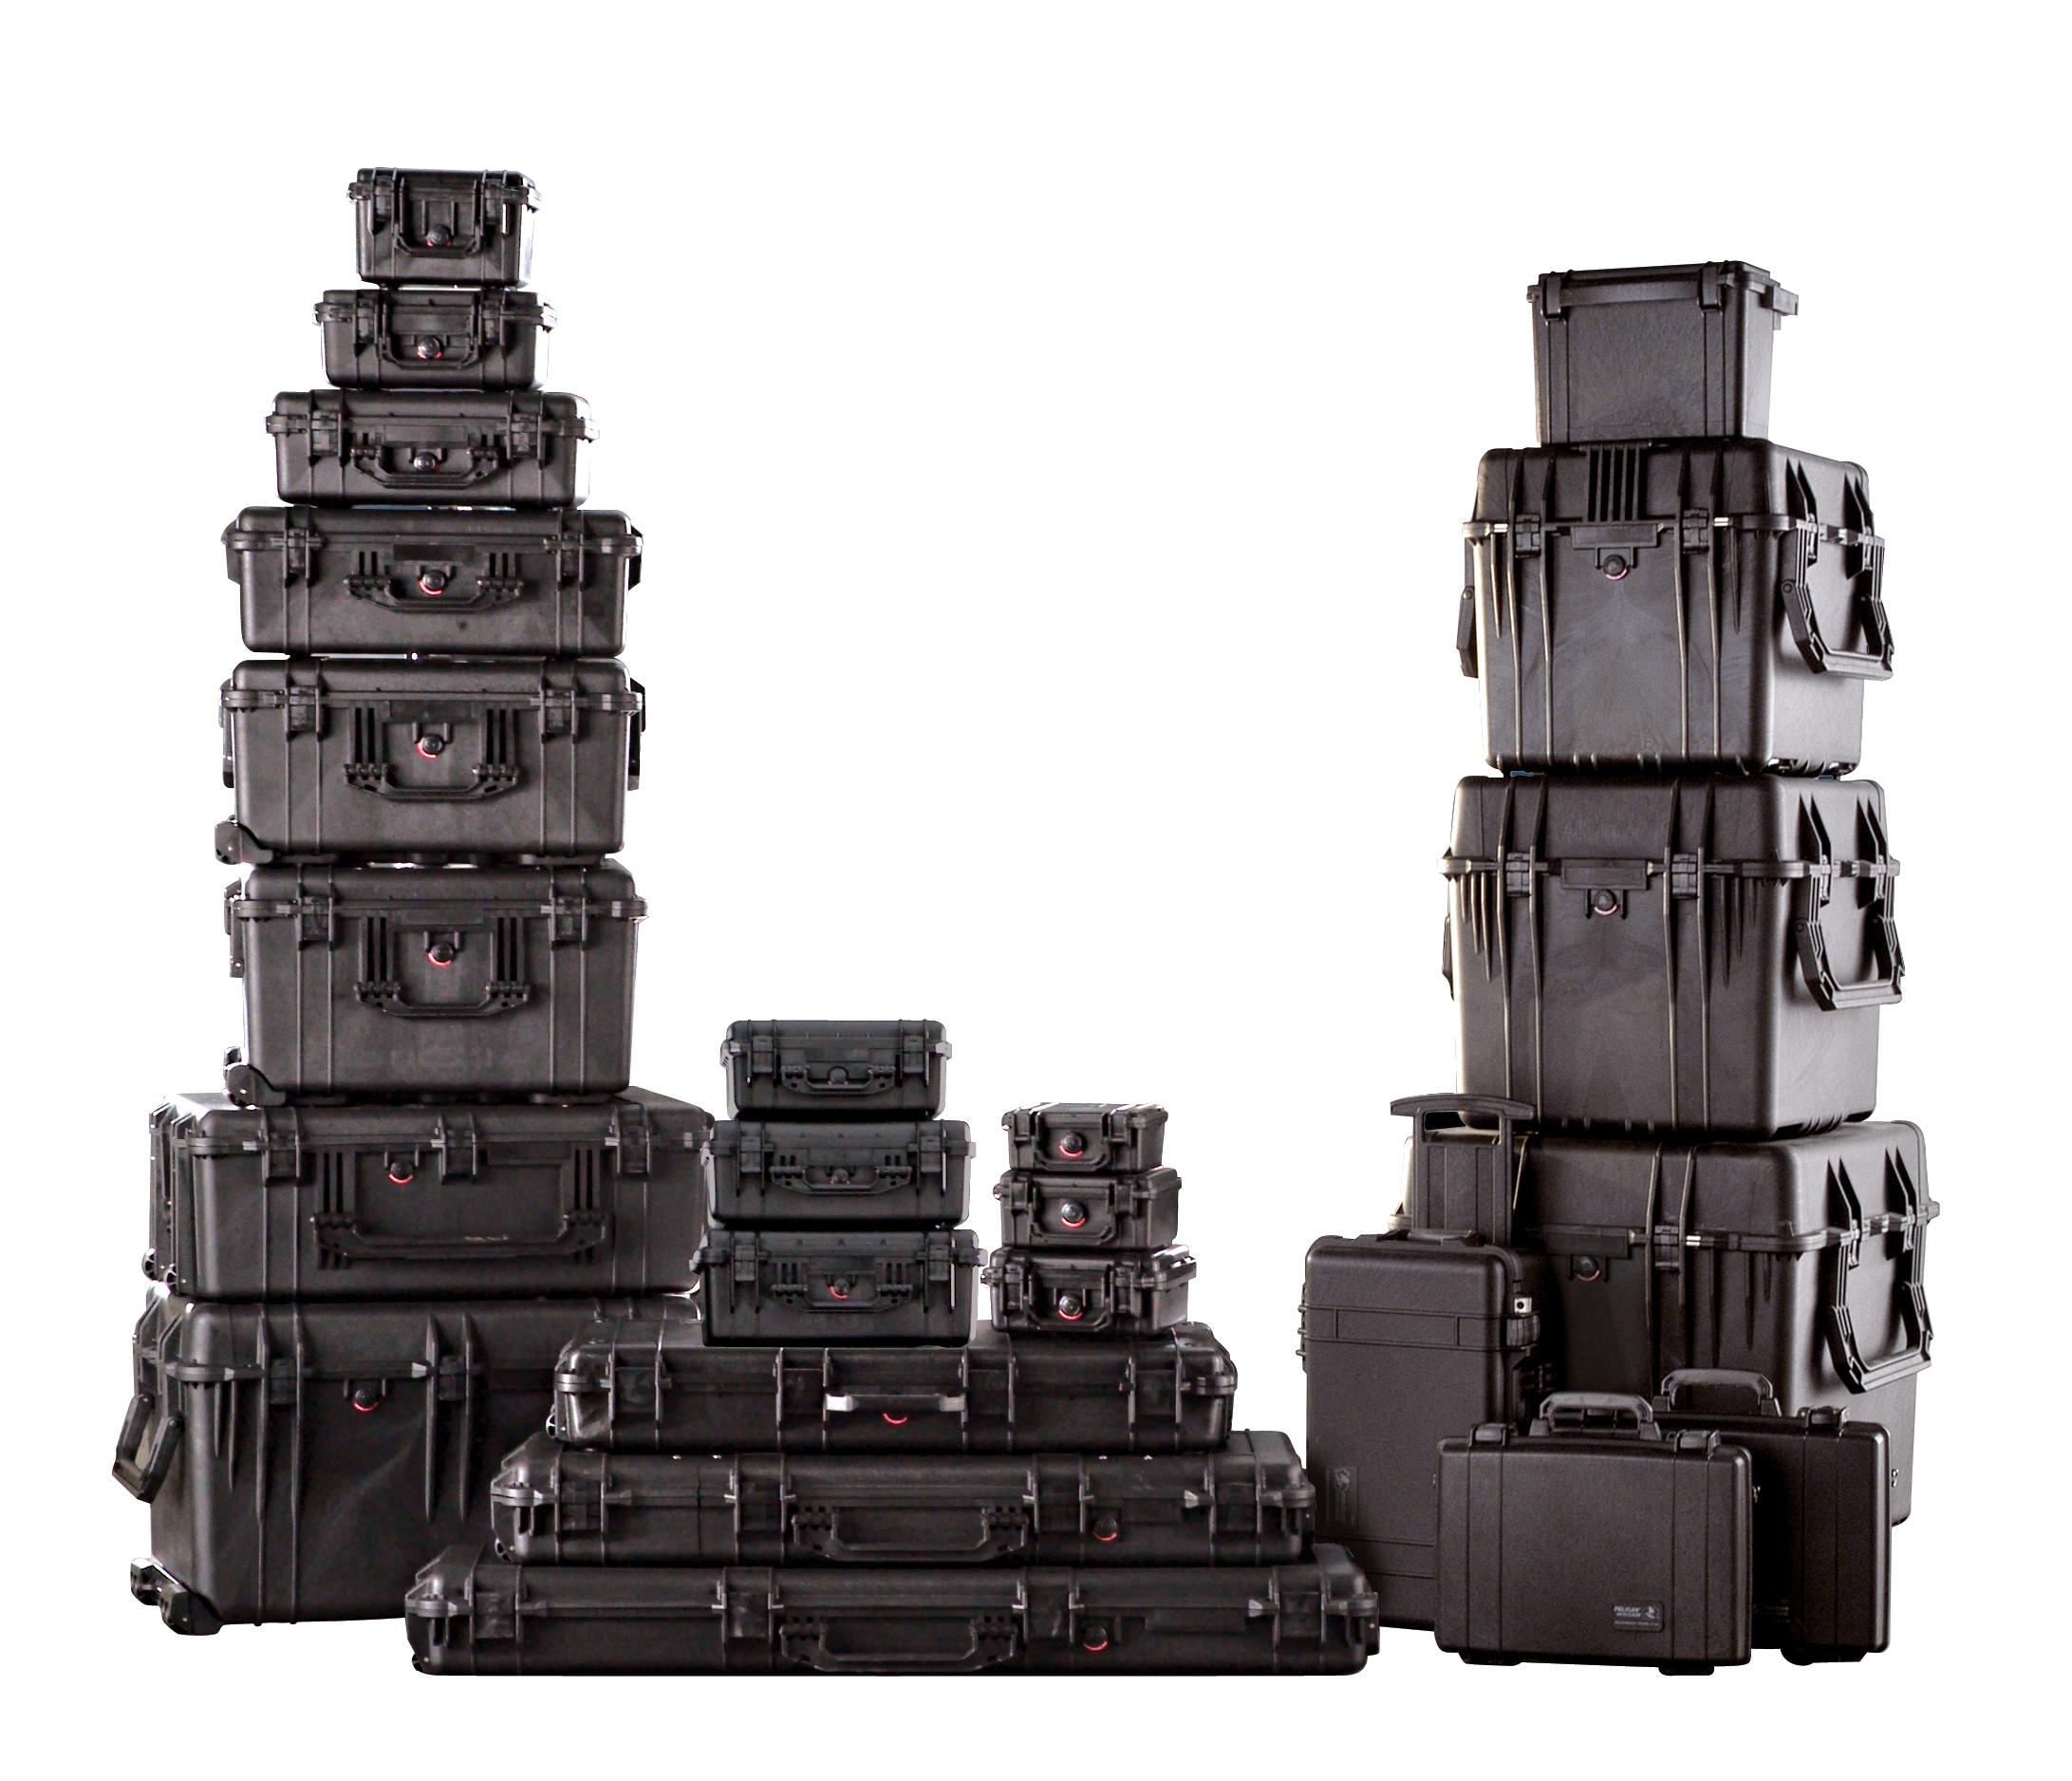 Infobox - Peli protector case™